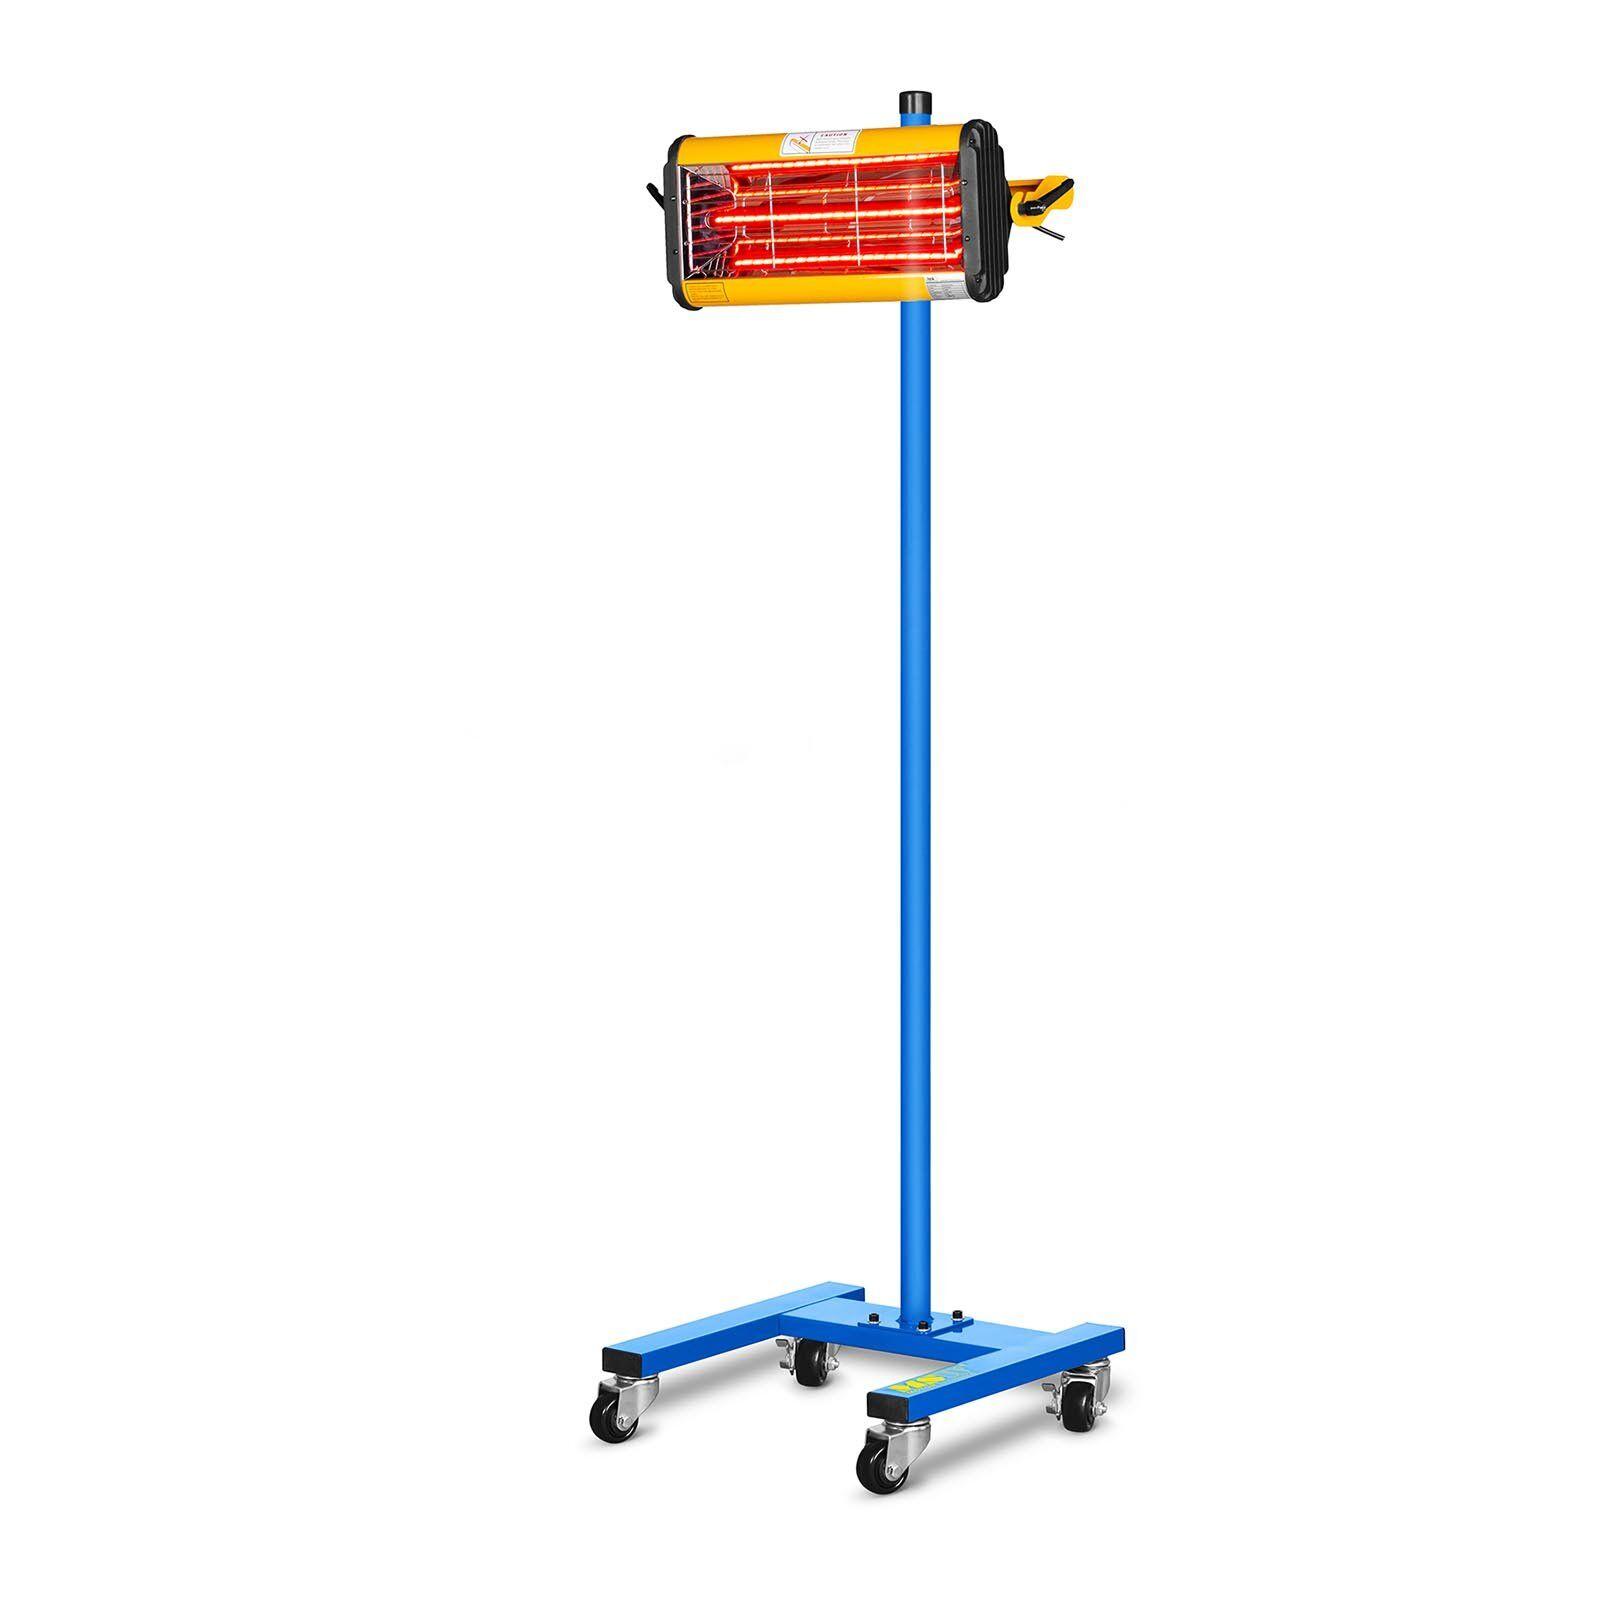 MSW Lampe infrarouge carrosserie - 1100 W - 1 émetteur IR-DRYER1000